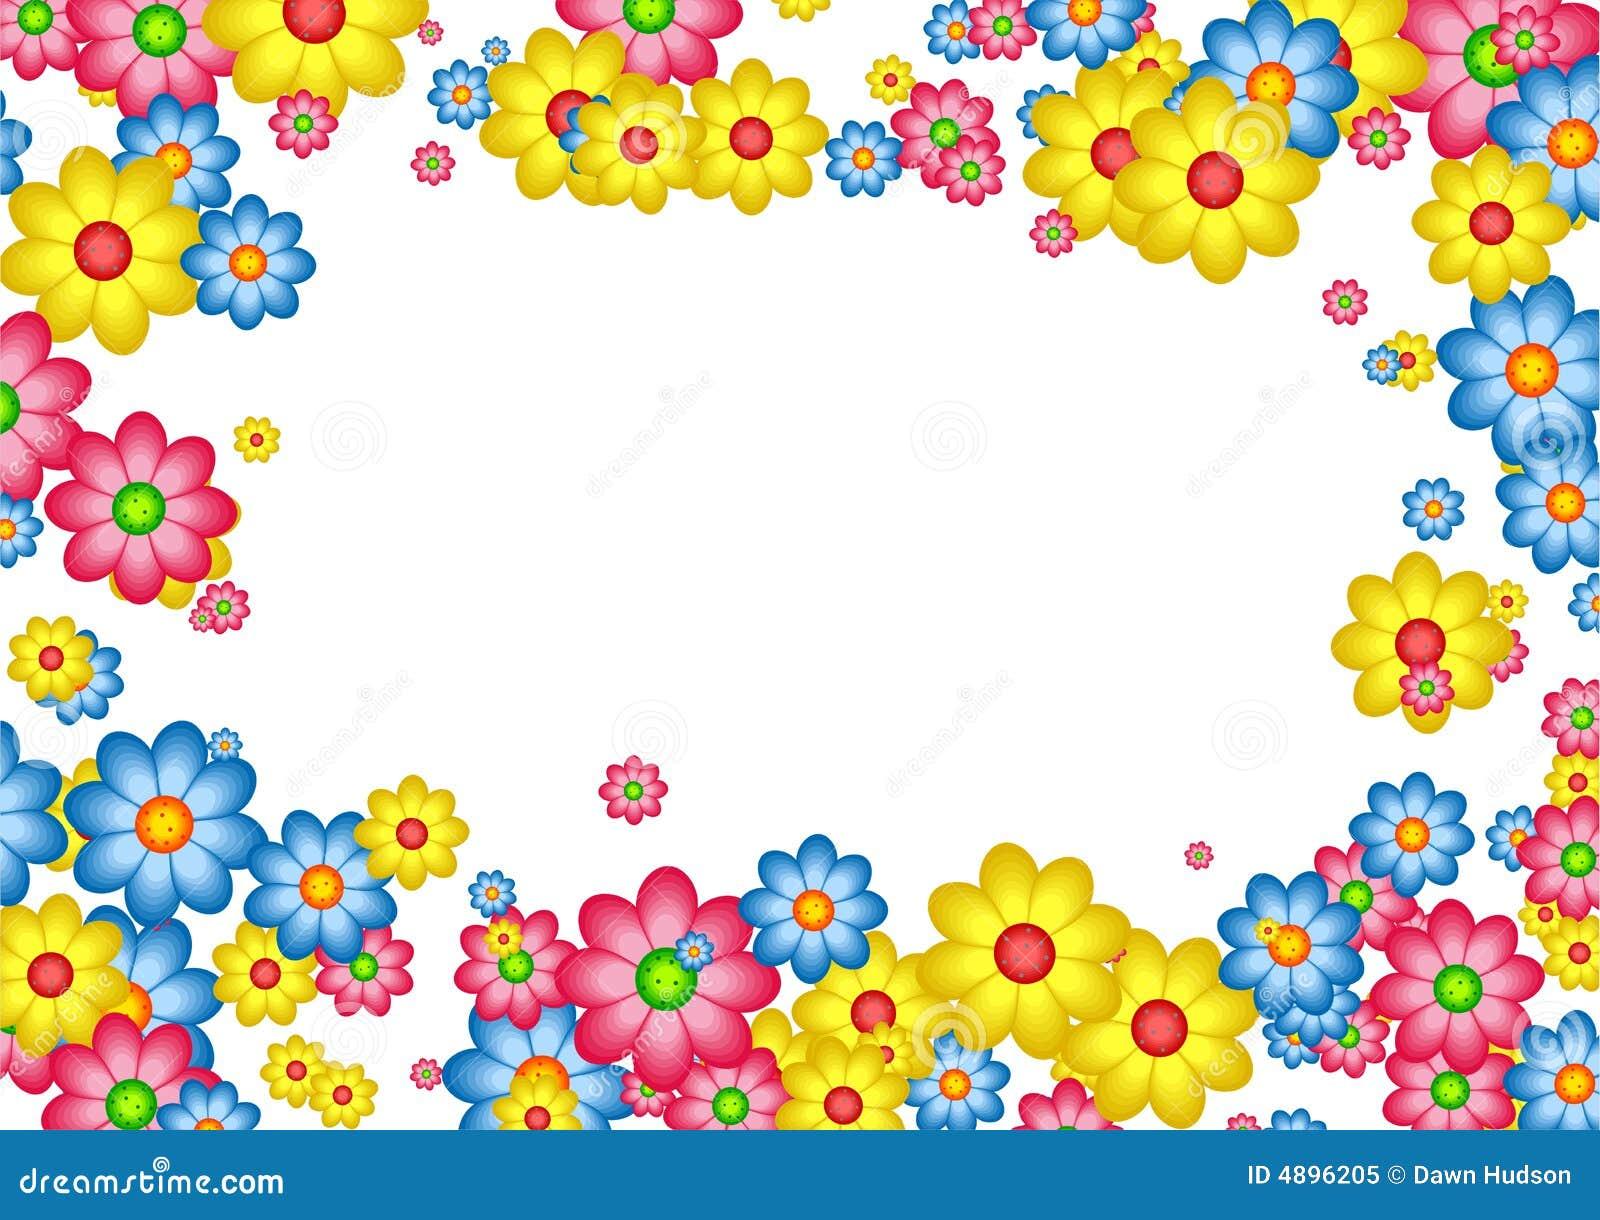 Daisy border stock illustration. Illustration of hedge ...